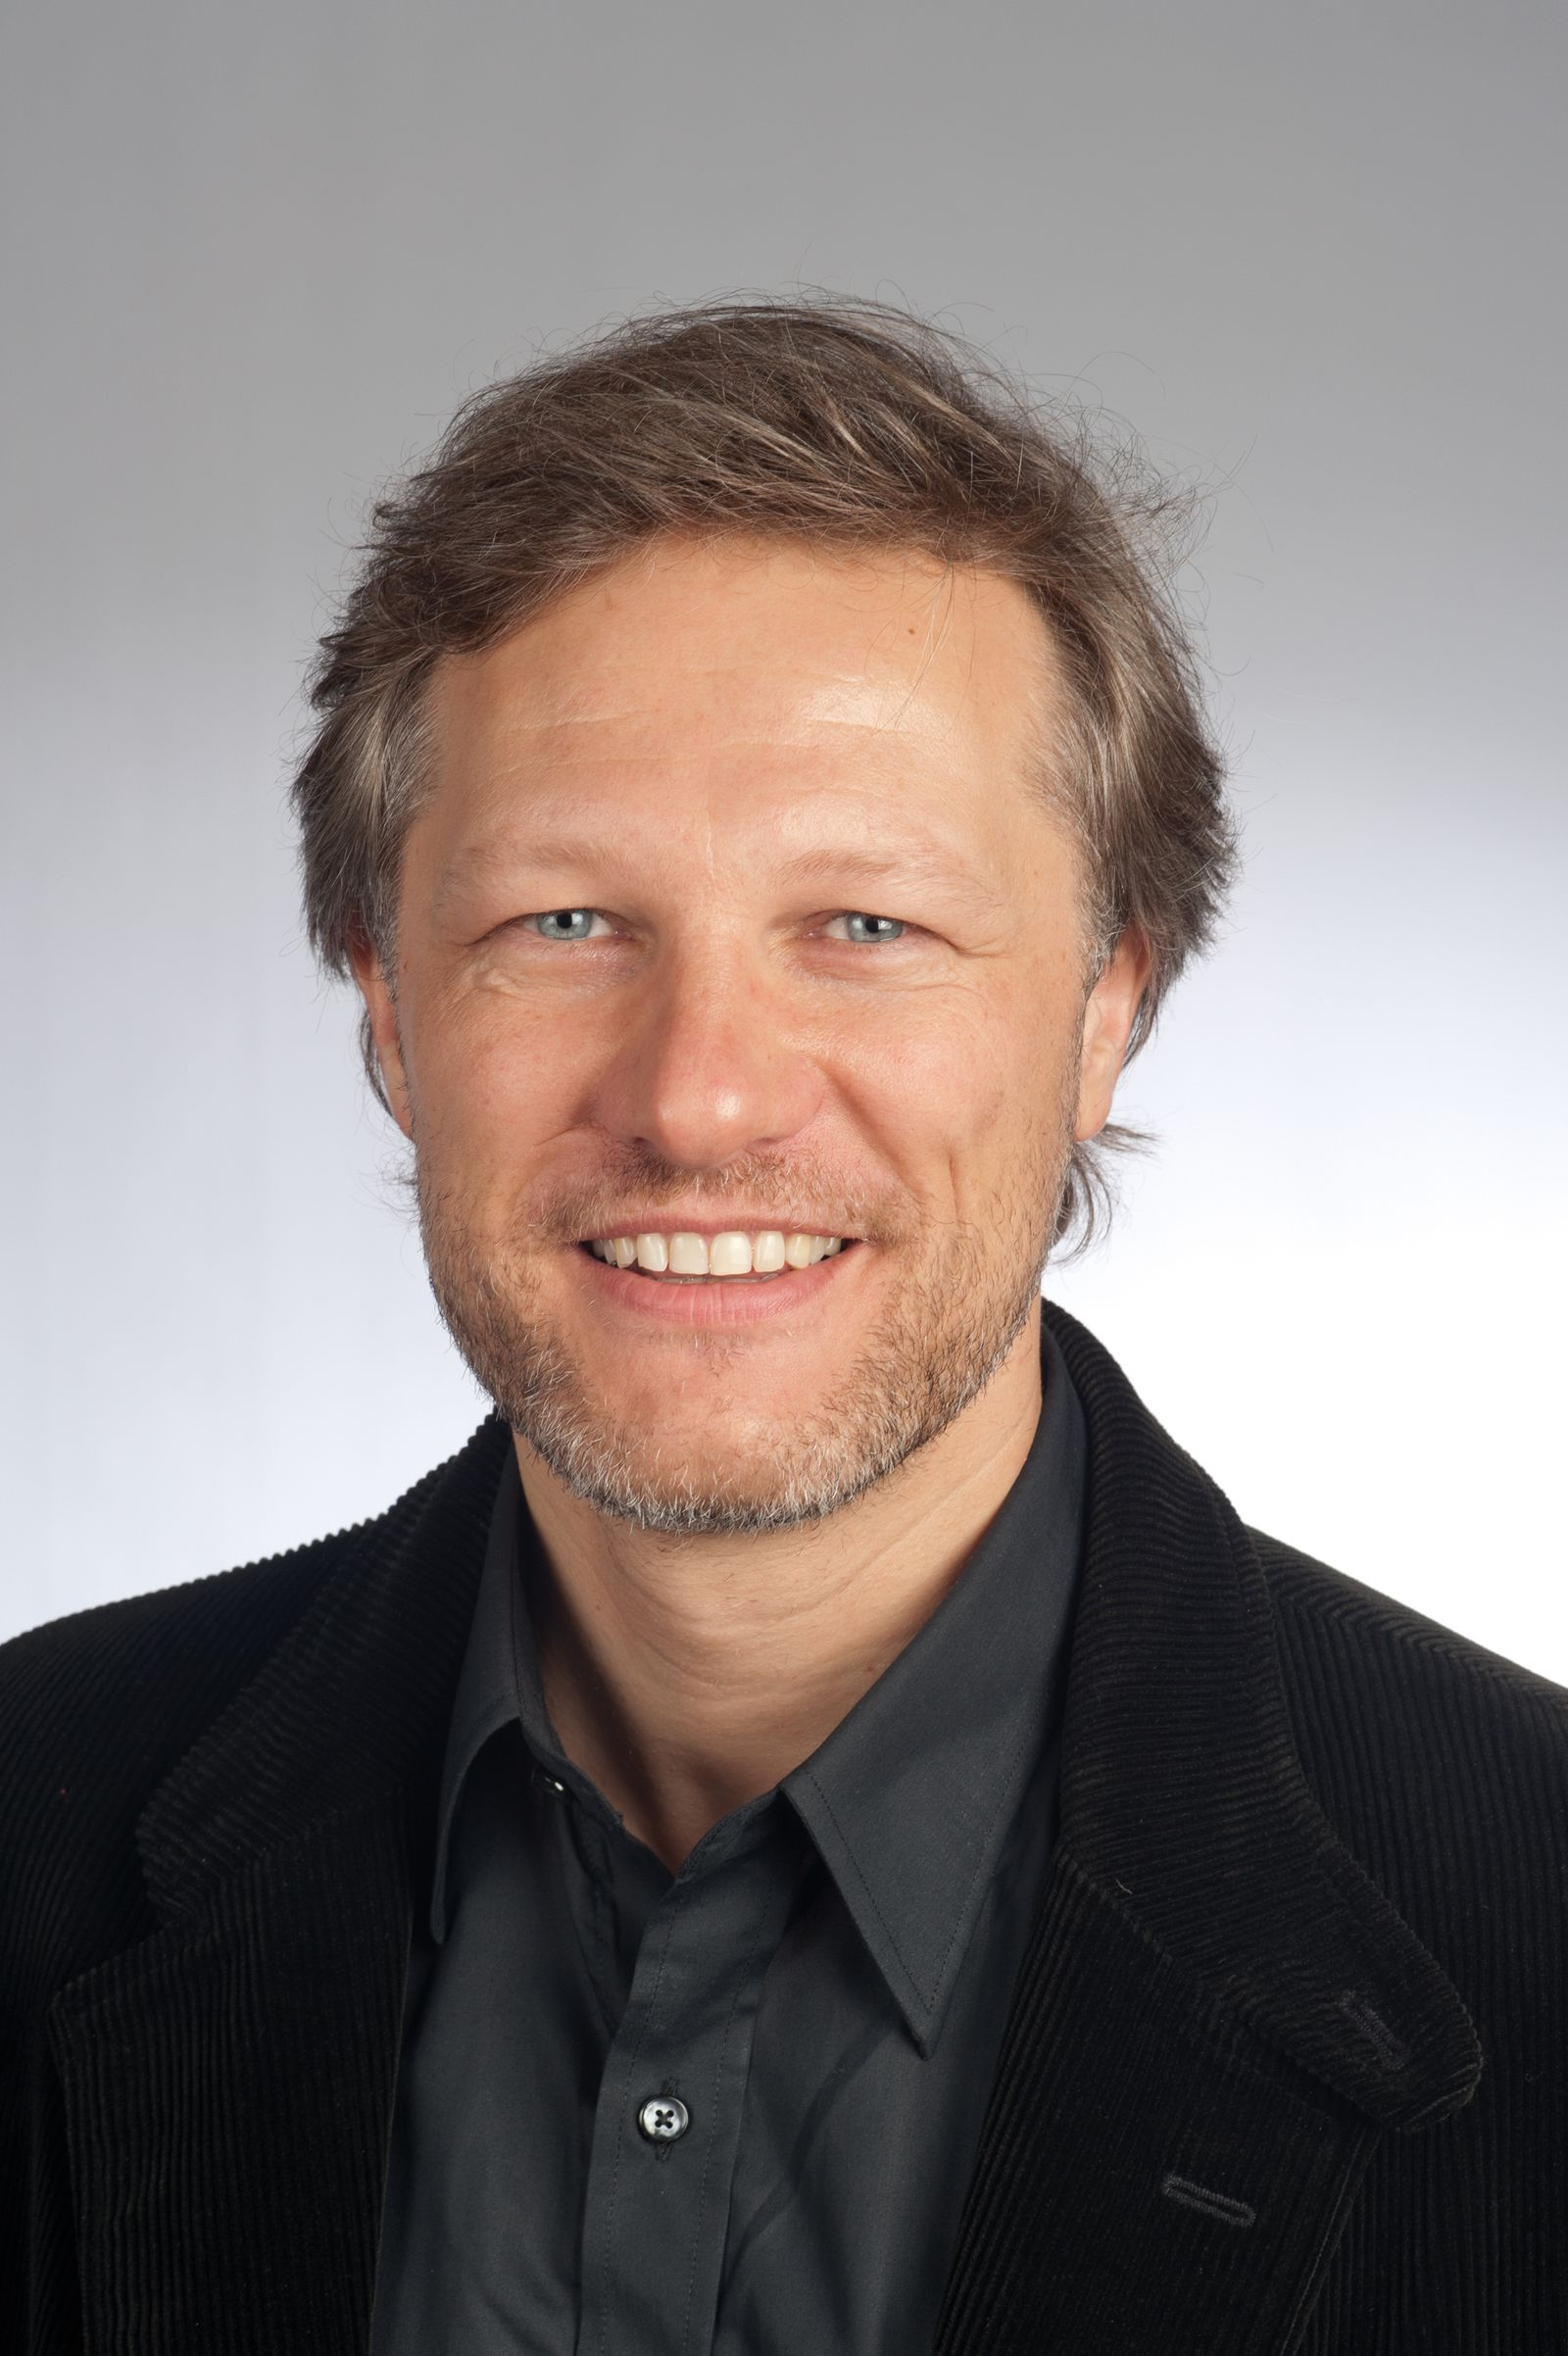 Stephan Gerhard Huber